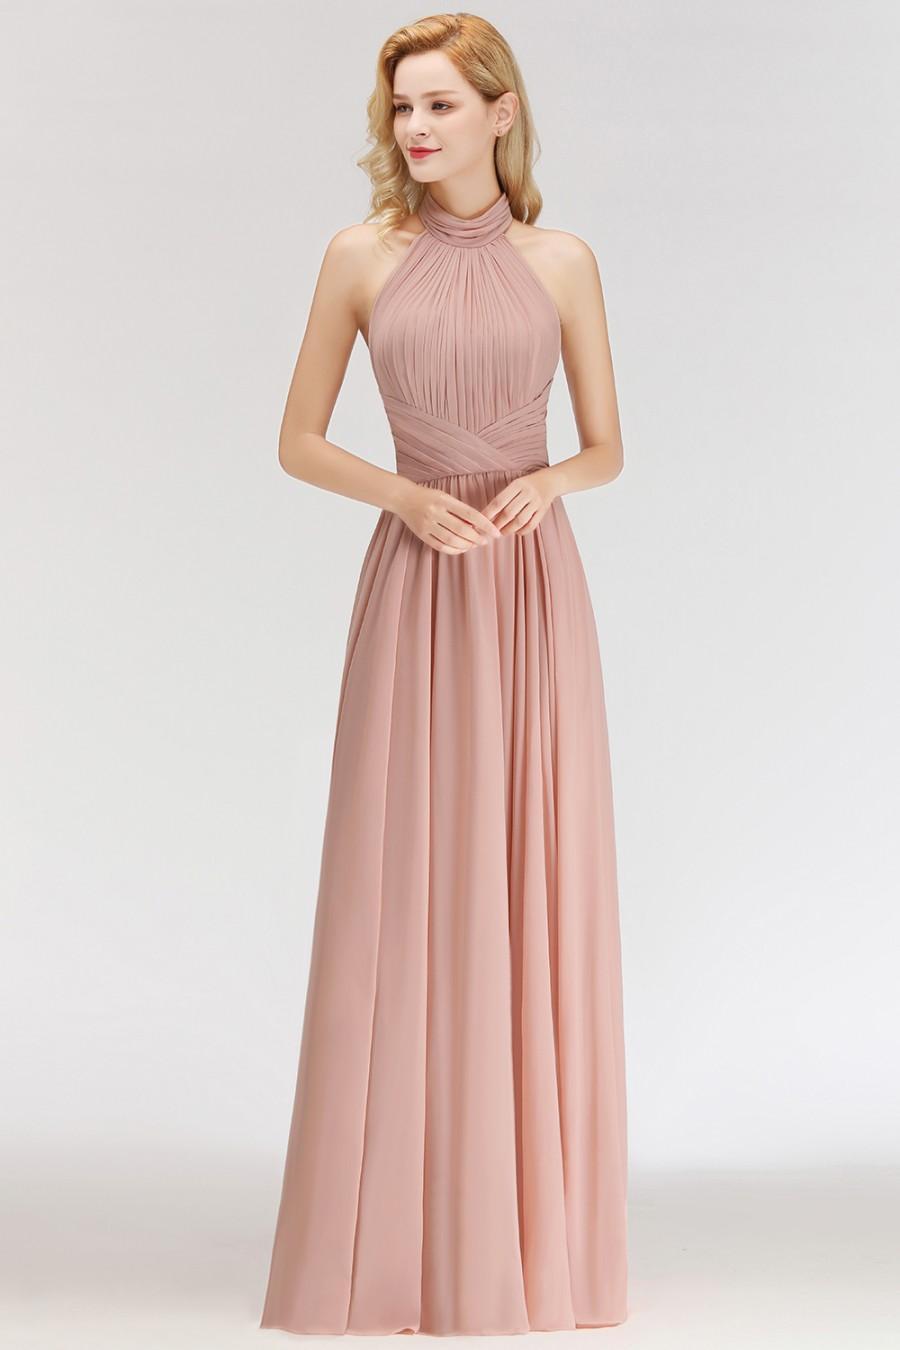 Modern Rosa Long Chiffon Brautjungfernkleider Etuikleid Kleider